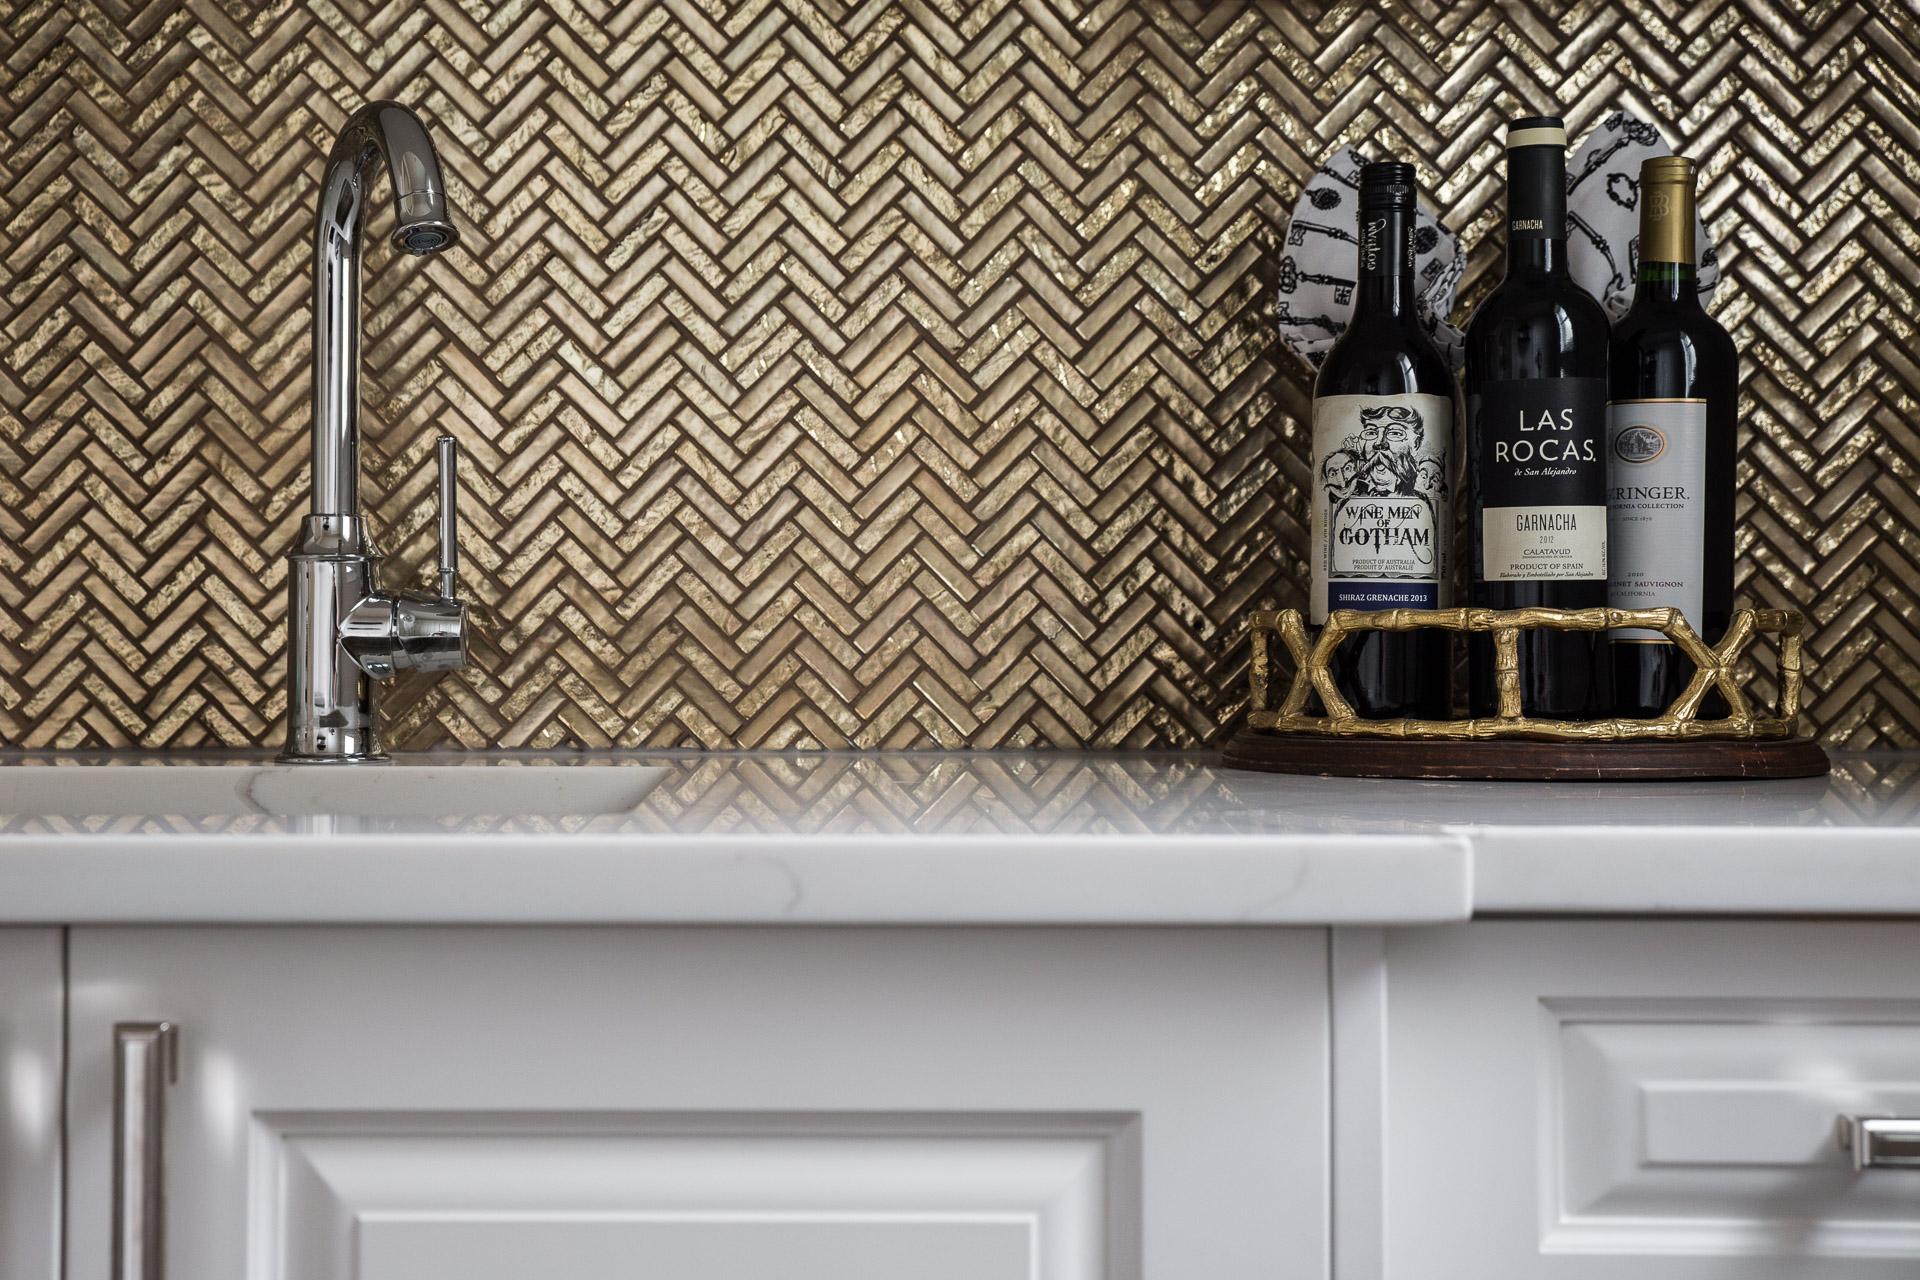 - Gold-backsplash-kitchen-cabinet-detail - Klassen Photography